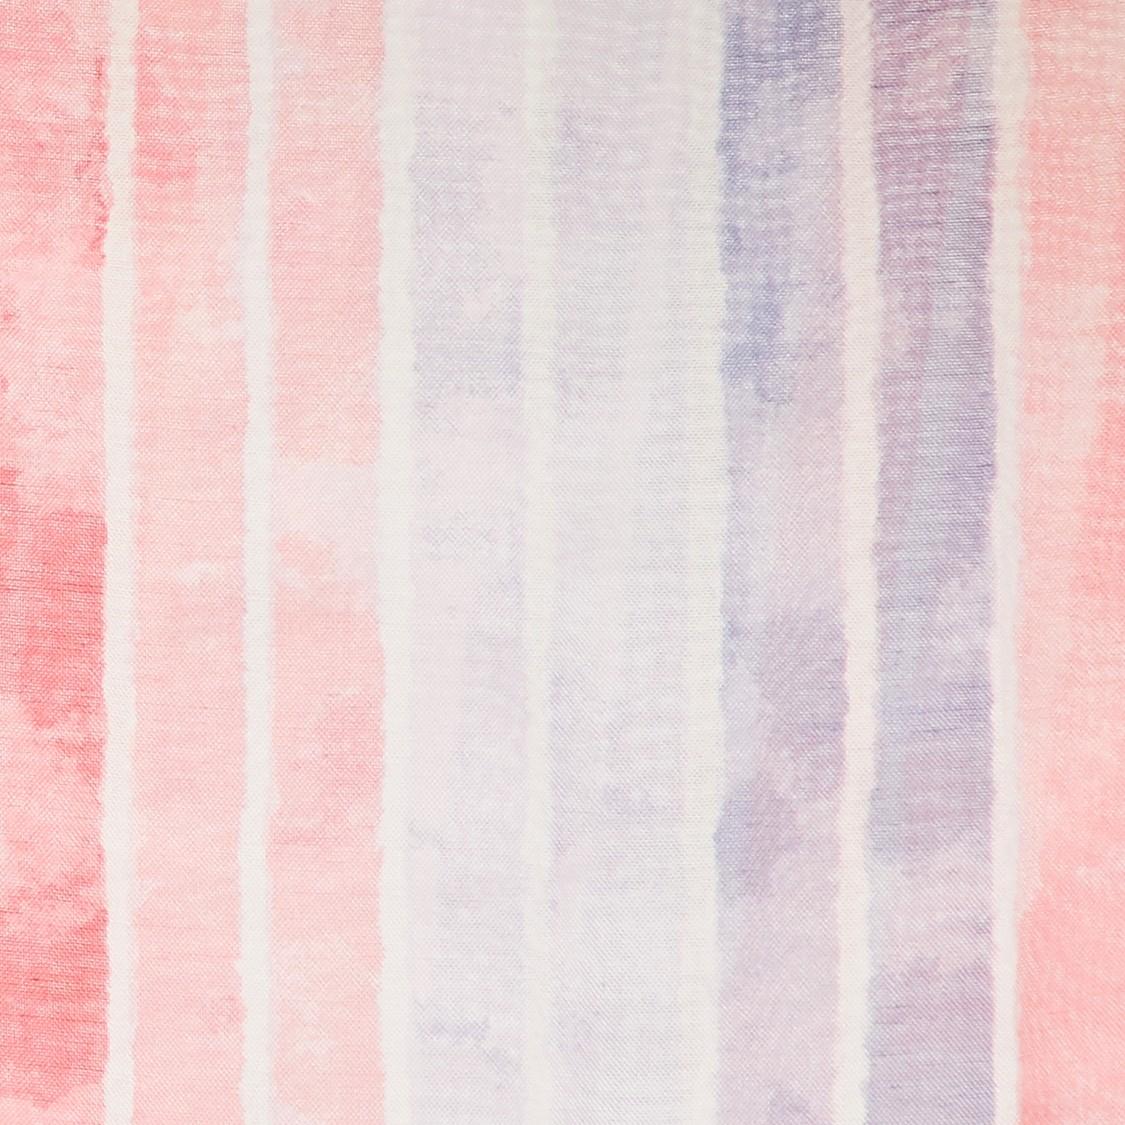 MAX Colourblocked Tassel Detailed Scarf